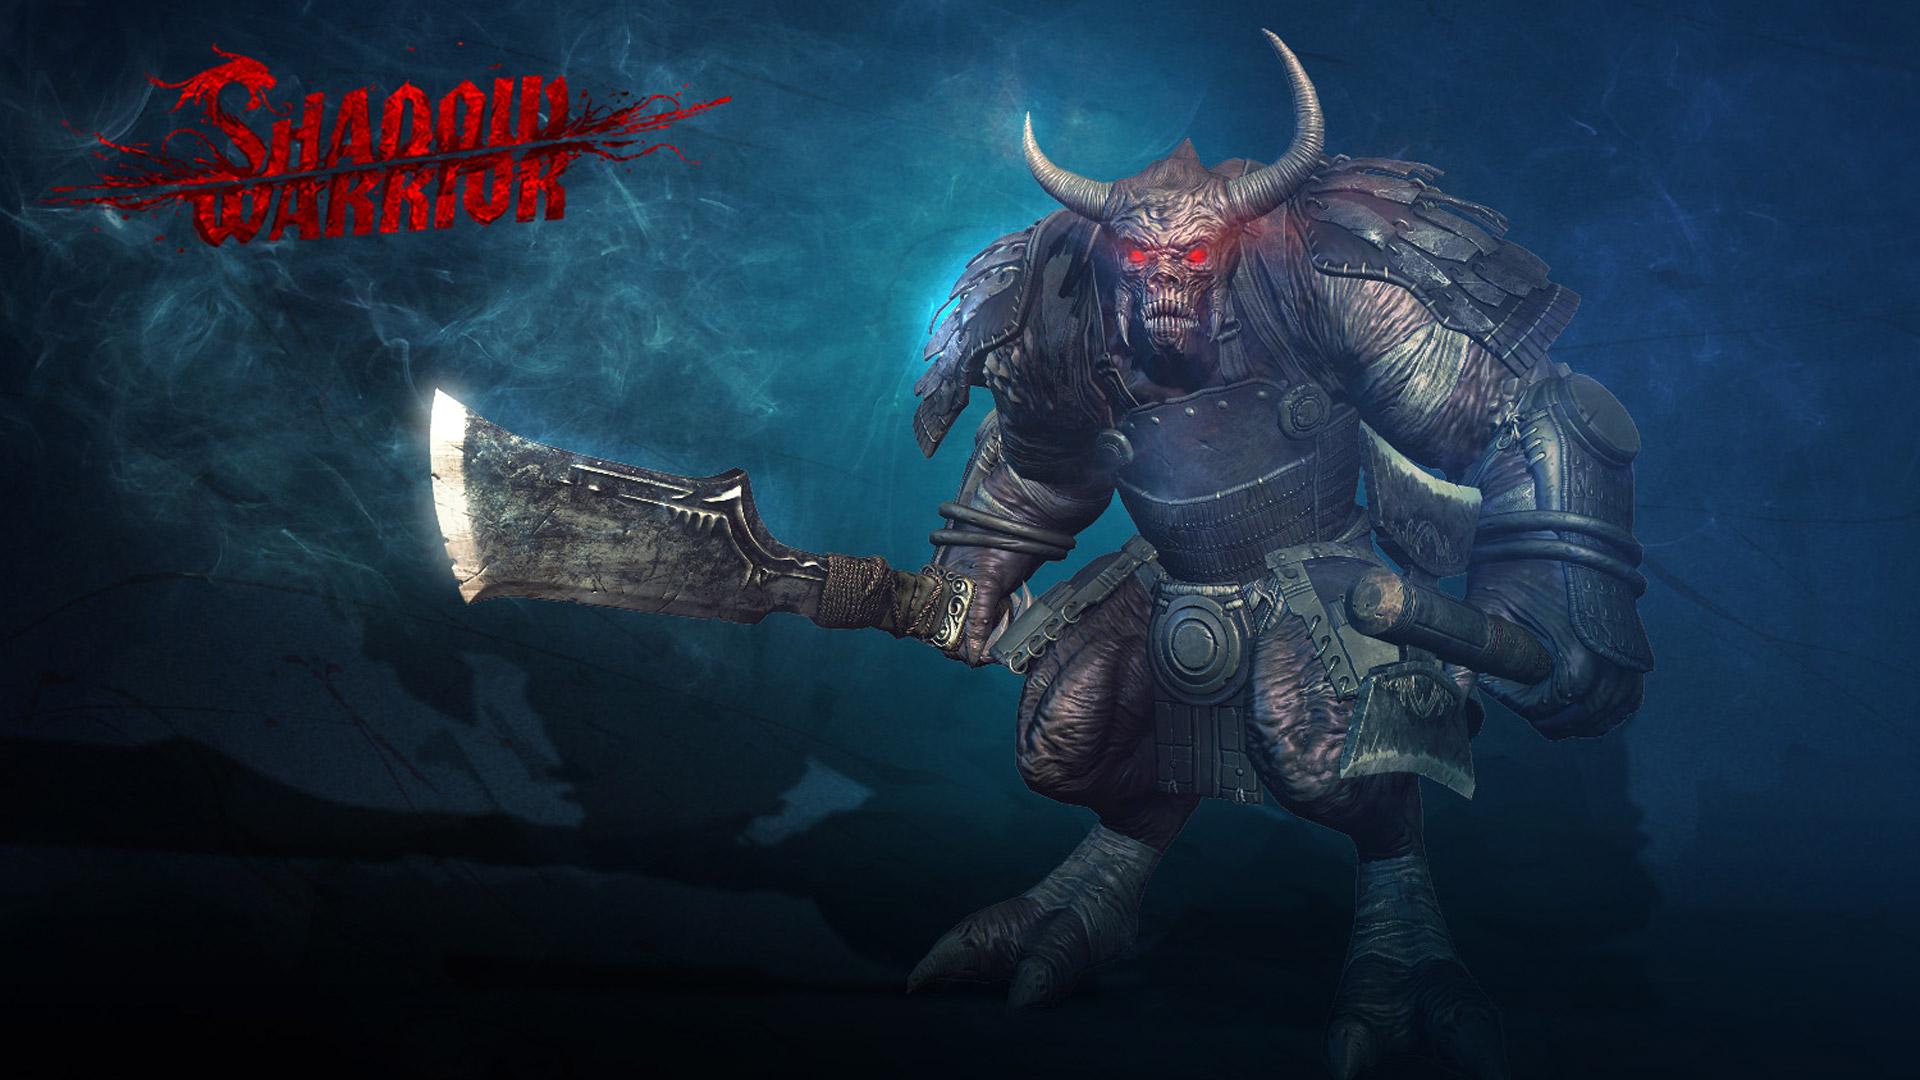 Shadow Warrior wallpaper 4